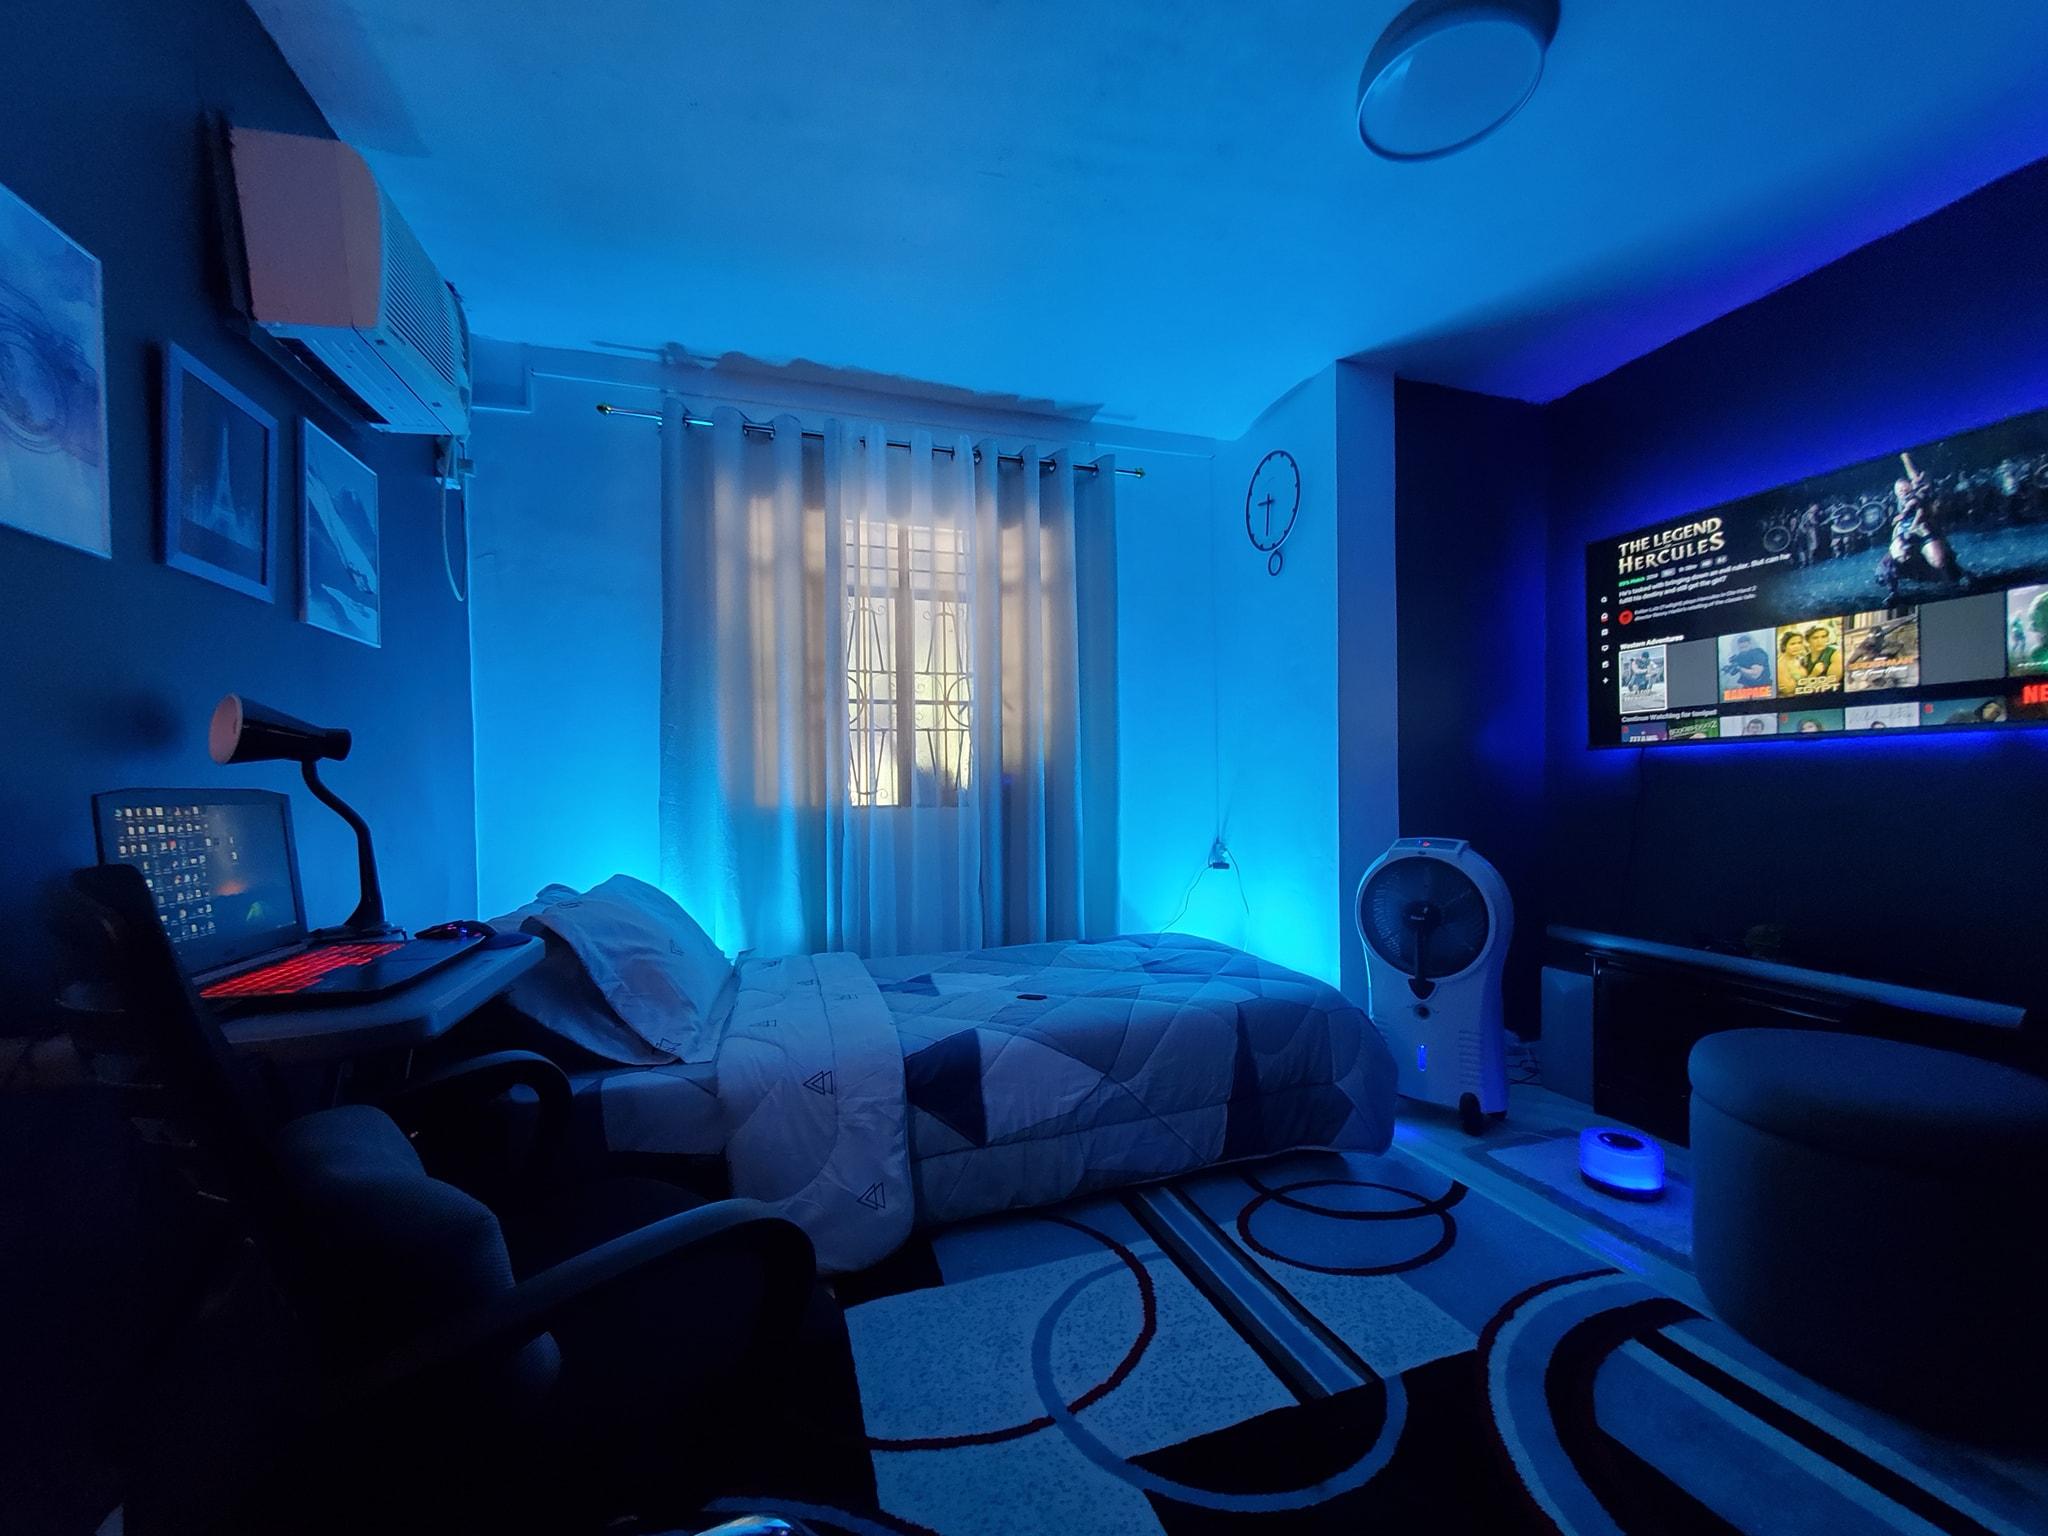 impressive room transformation